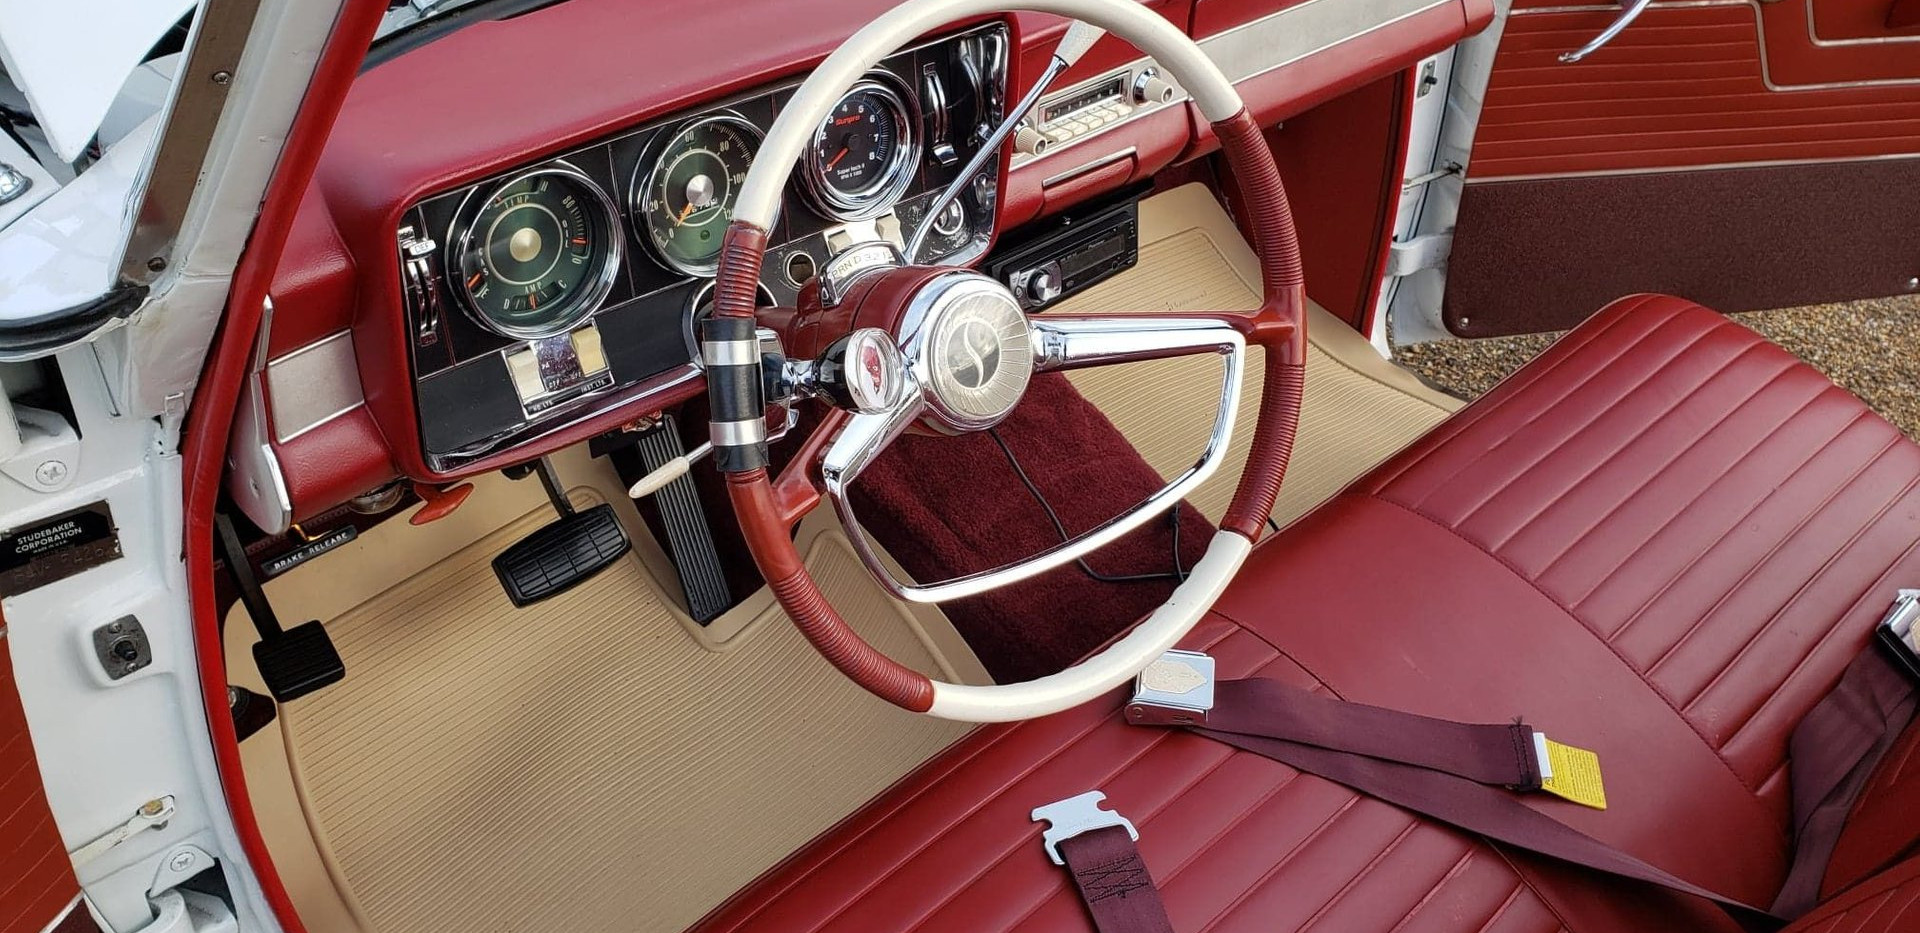 1964-studebaker-lark-daytona (2).jpeg